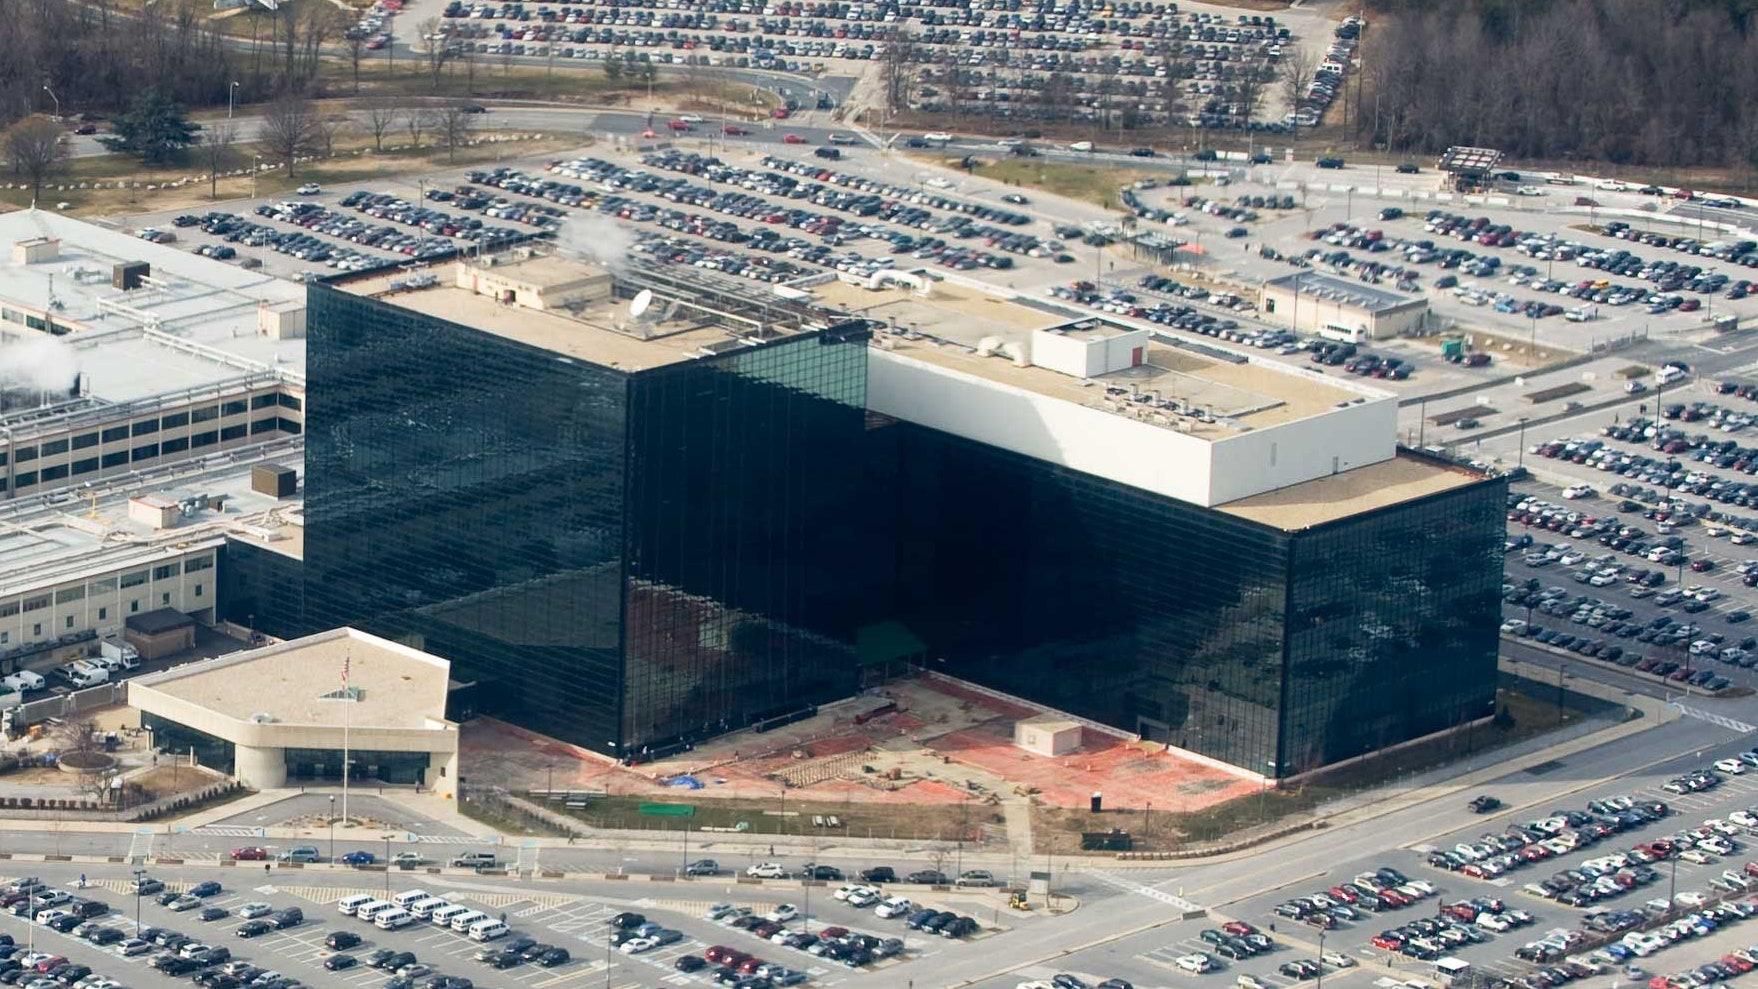 NSA Headquarters. Fort Meade, Maryland, U.S. SAUL LOEB/AFP via Getty Images.